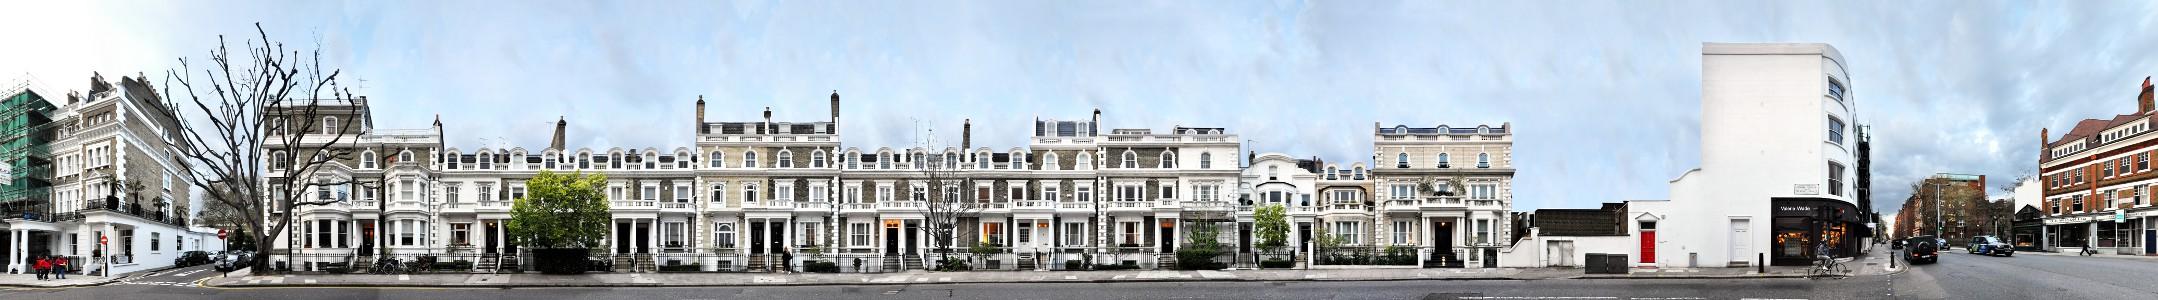 Neville Terrace